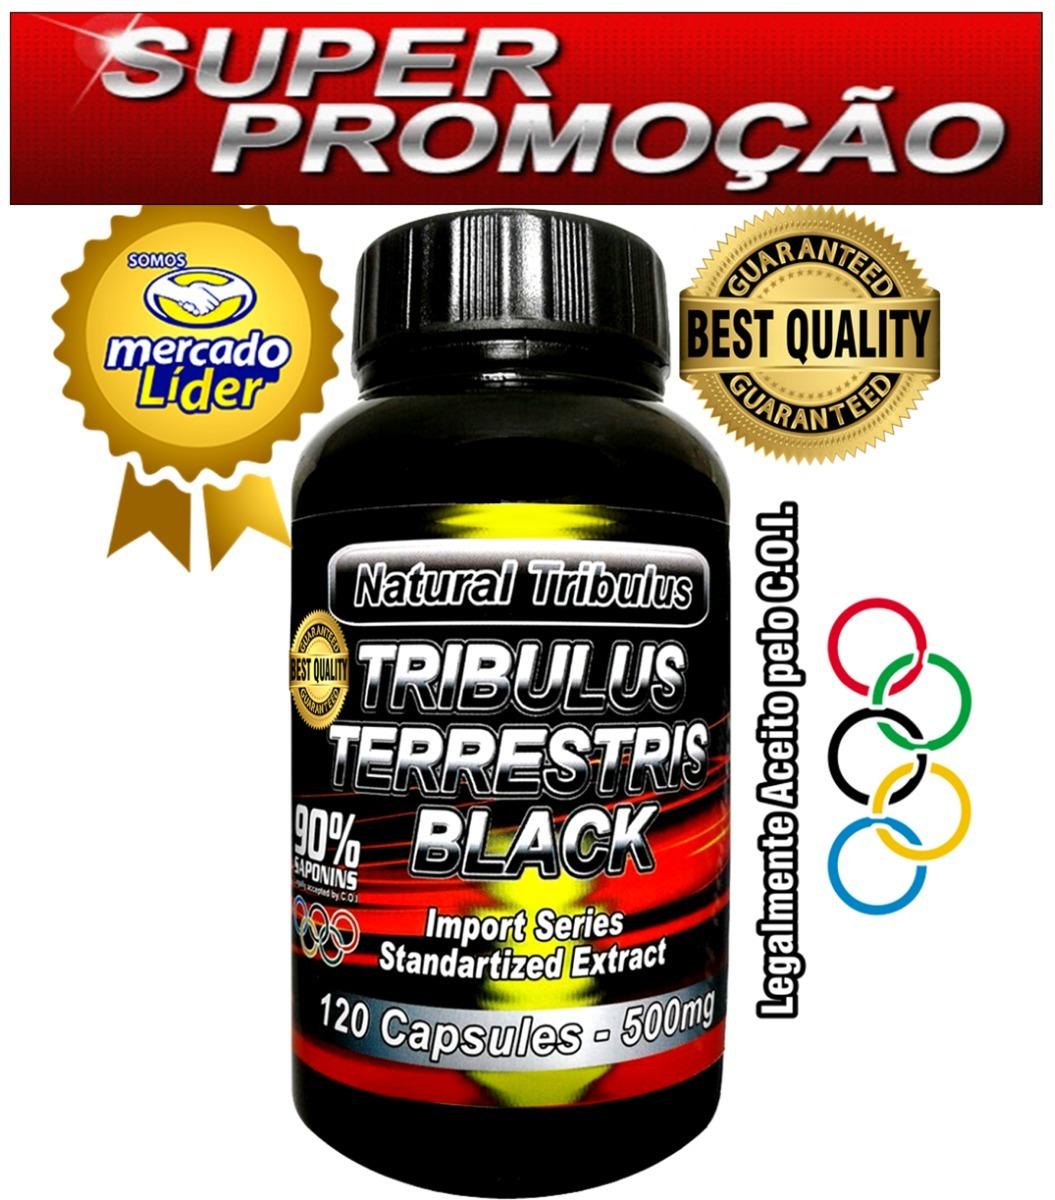 f57d7dfa0 Tribulus Terrestris Black 90% Saponinas Extrato Da Raiz - R  39